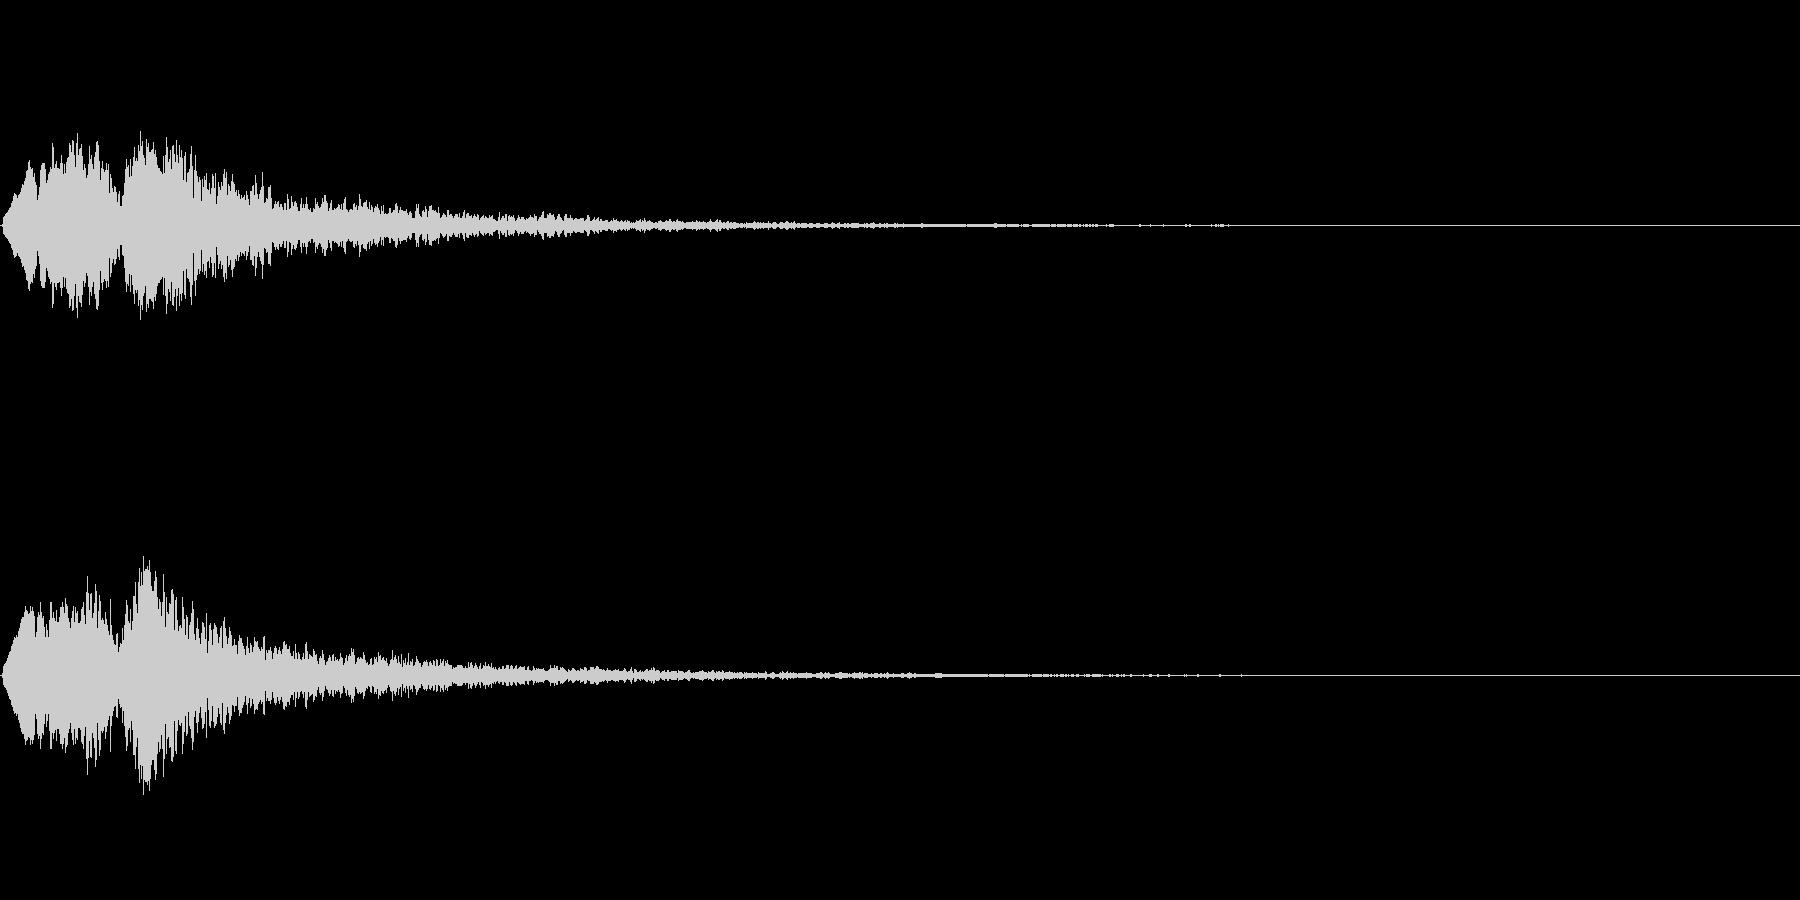 Vox 不気味な鳴き声 ホラーSE 5の未再生の波形